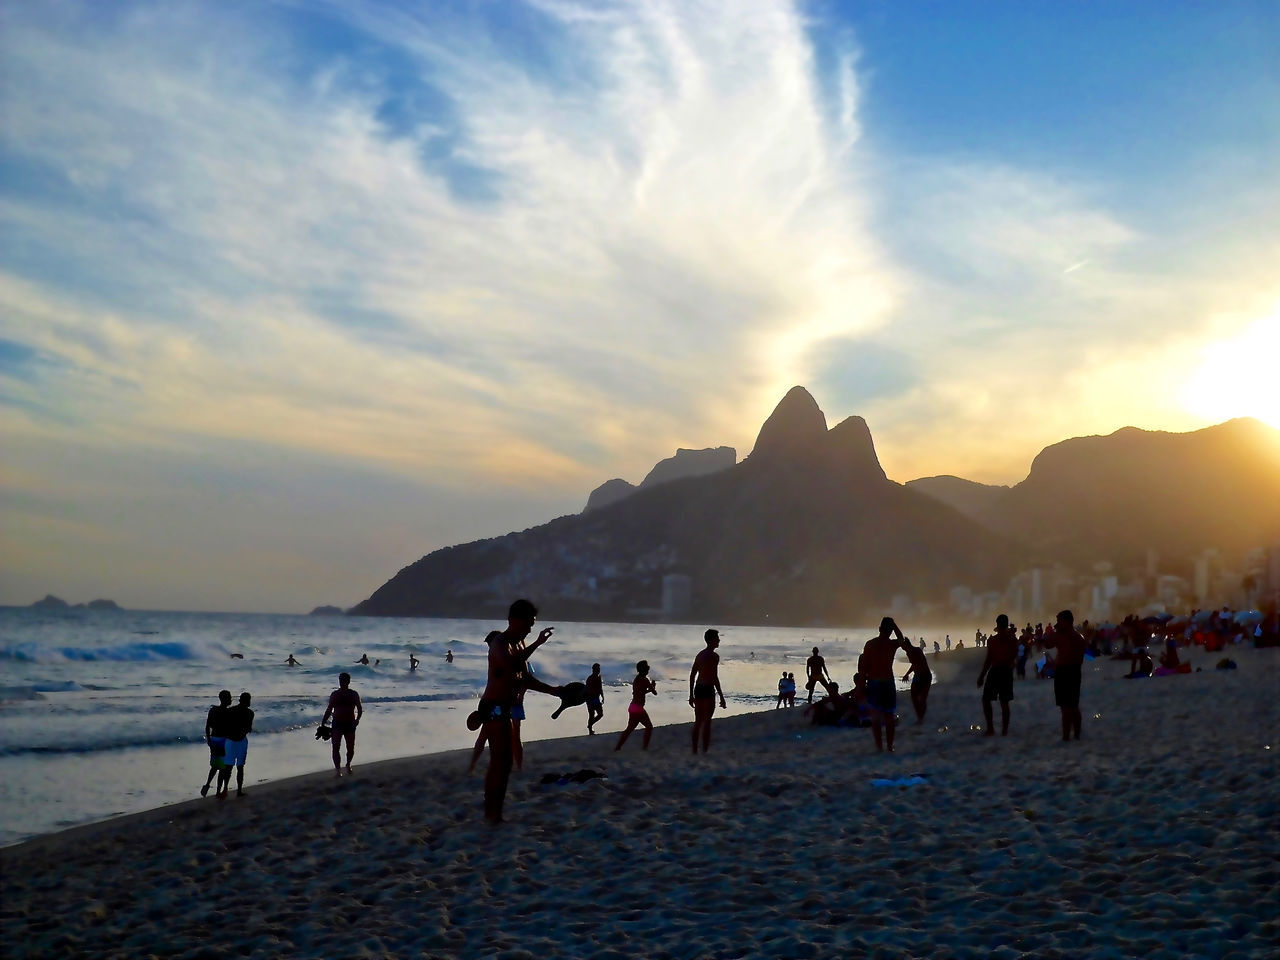 People Shadow And Light Rio De Janeiro Ipanema Beach Beach Nature Urban Hills Sunset Sunset Silhouettes Children